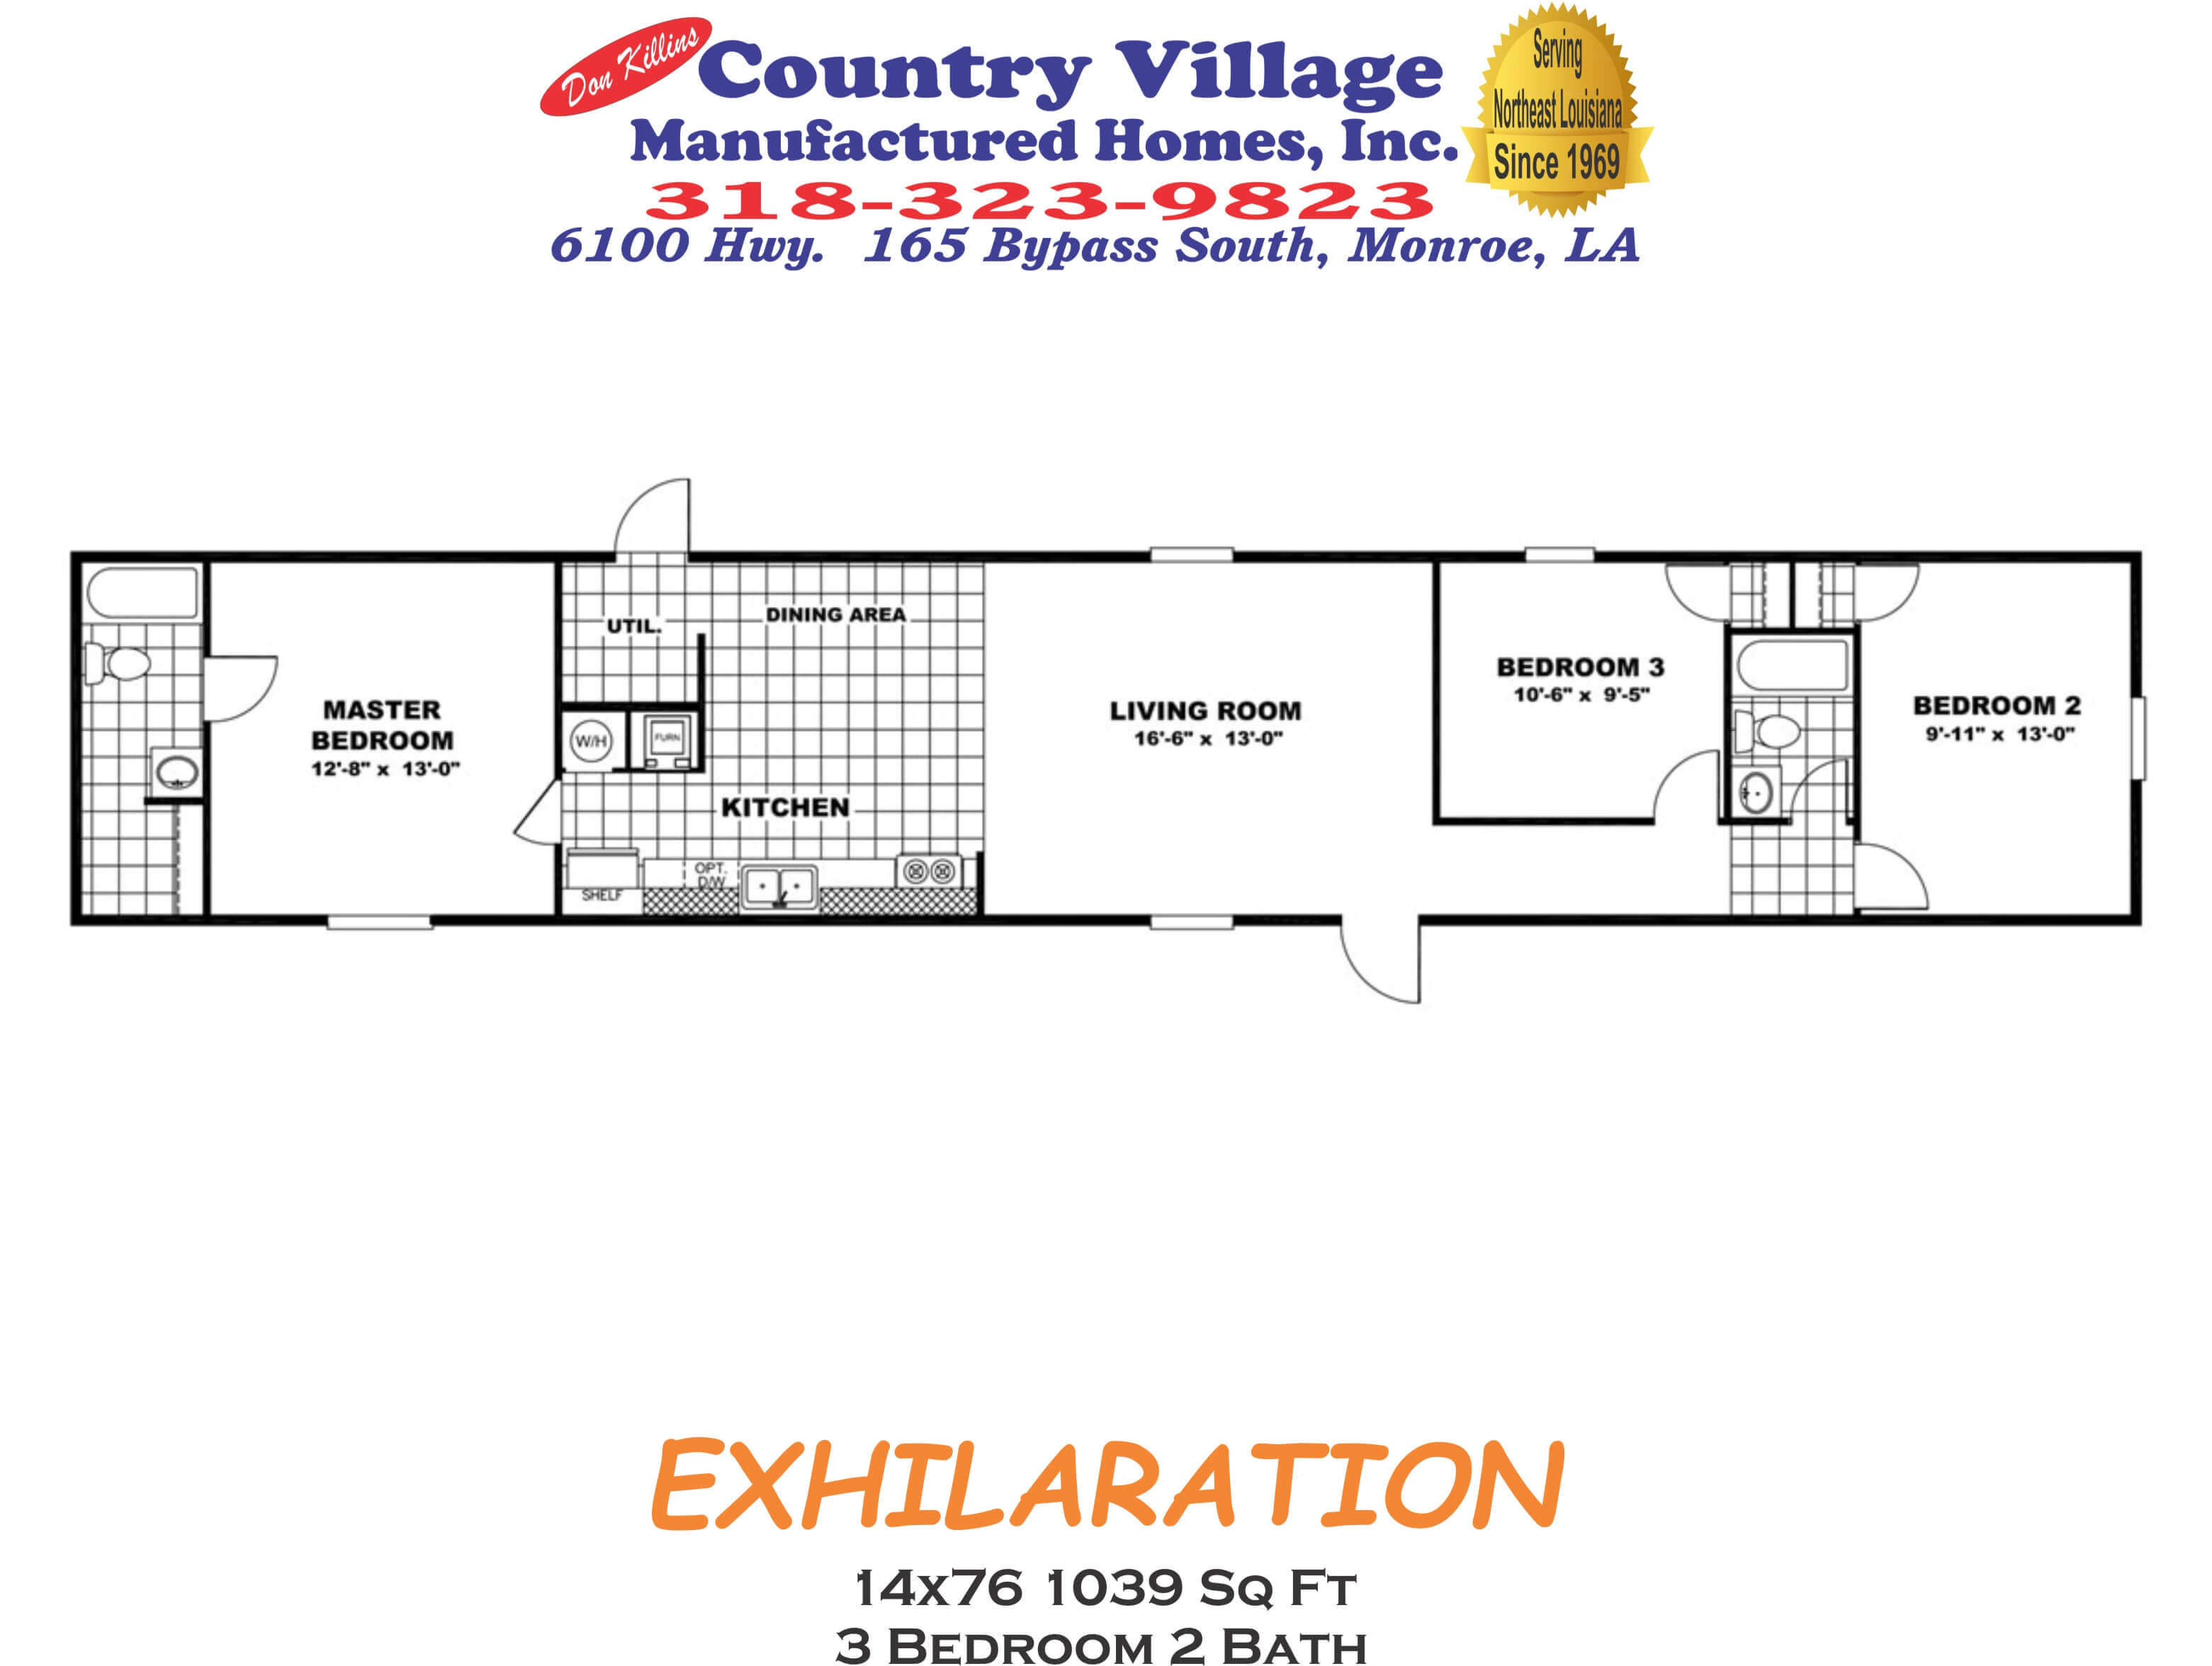 EXHILATION 14x76 1039 sq ft 3+2